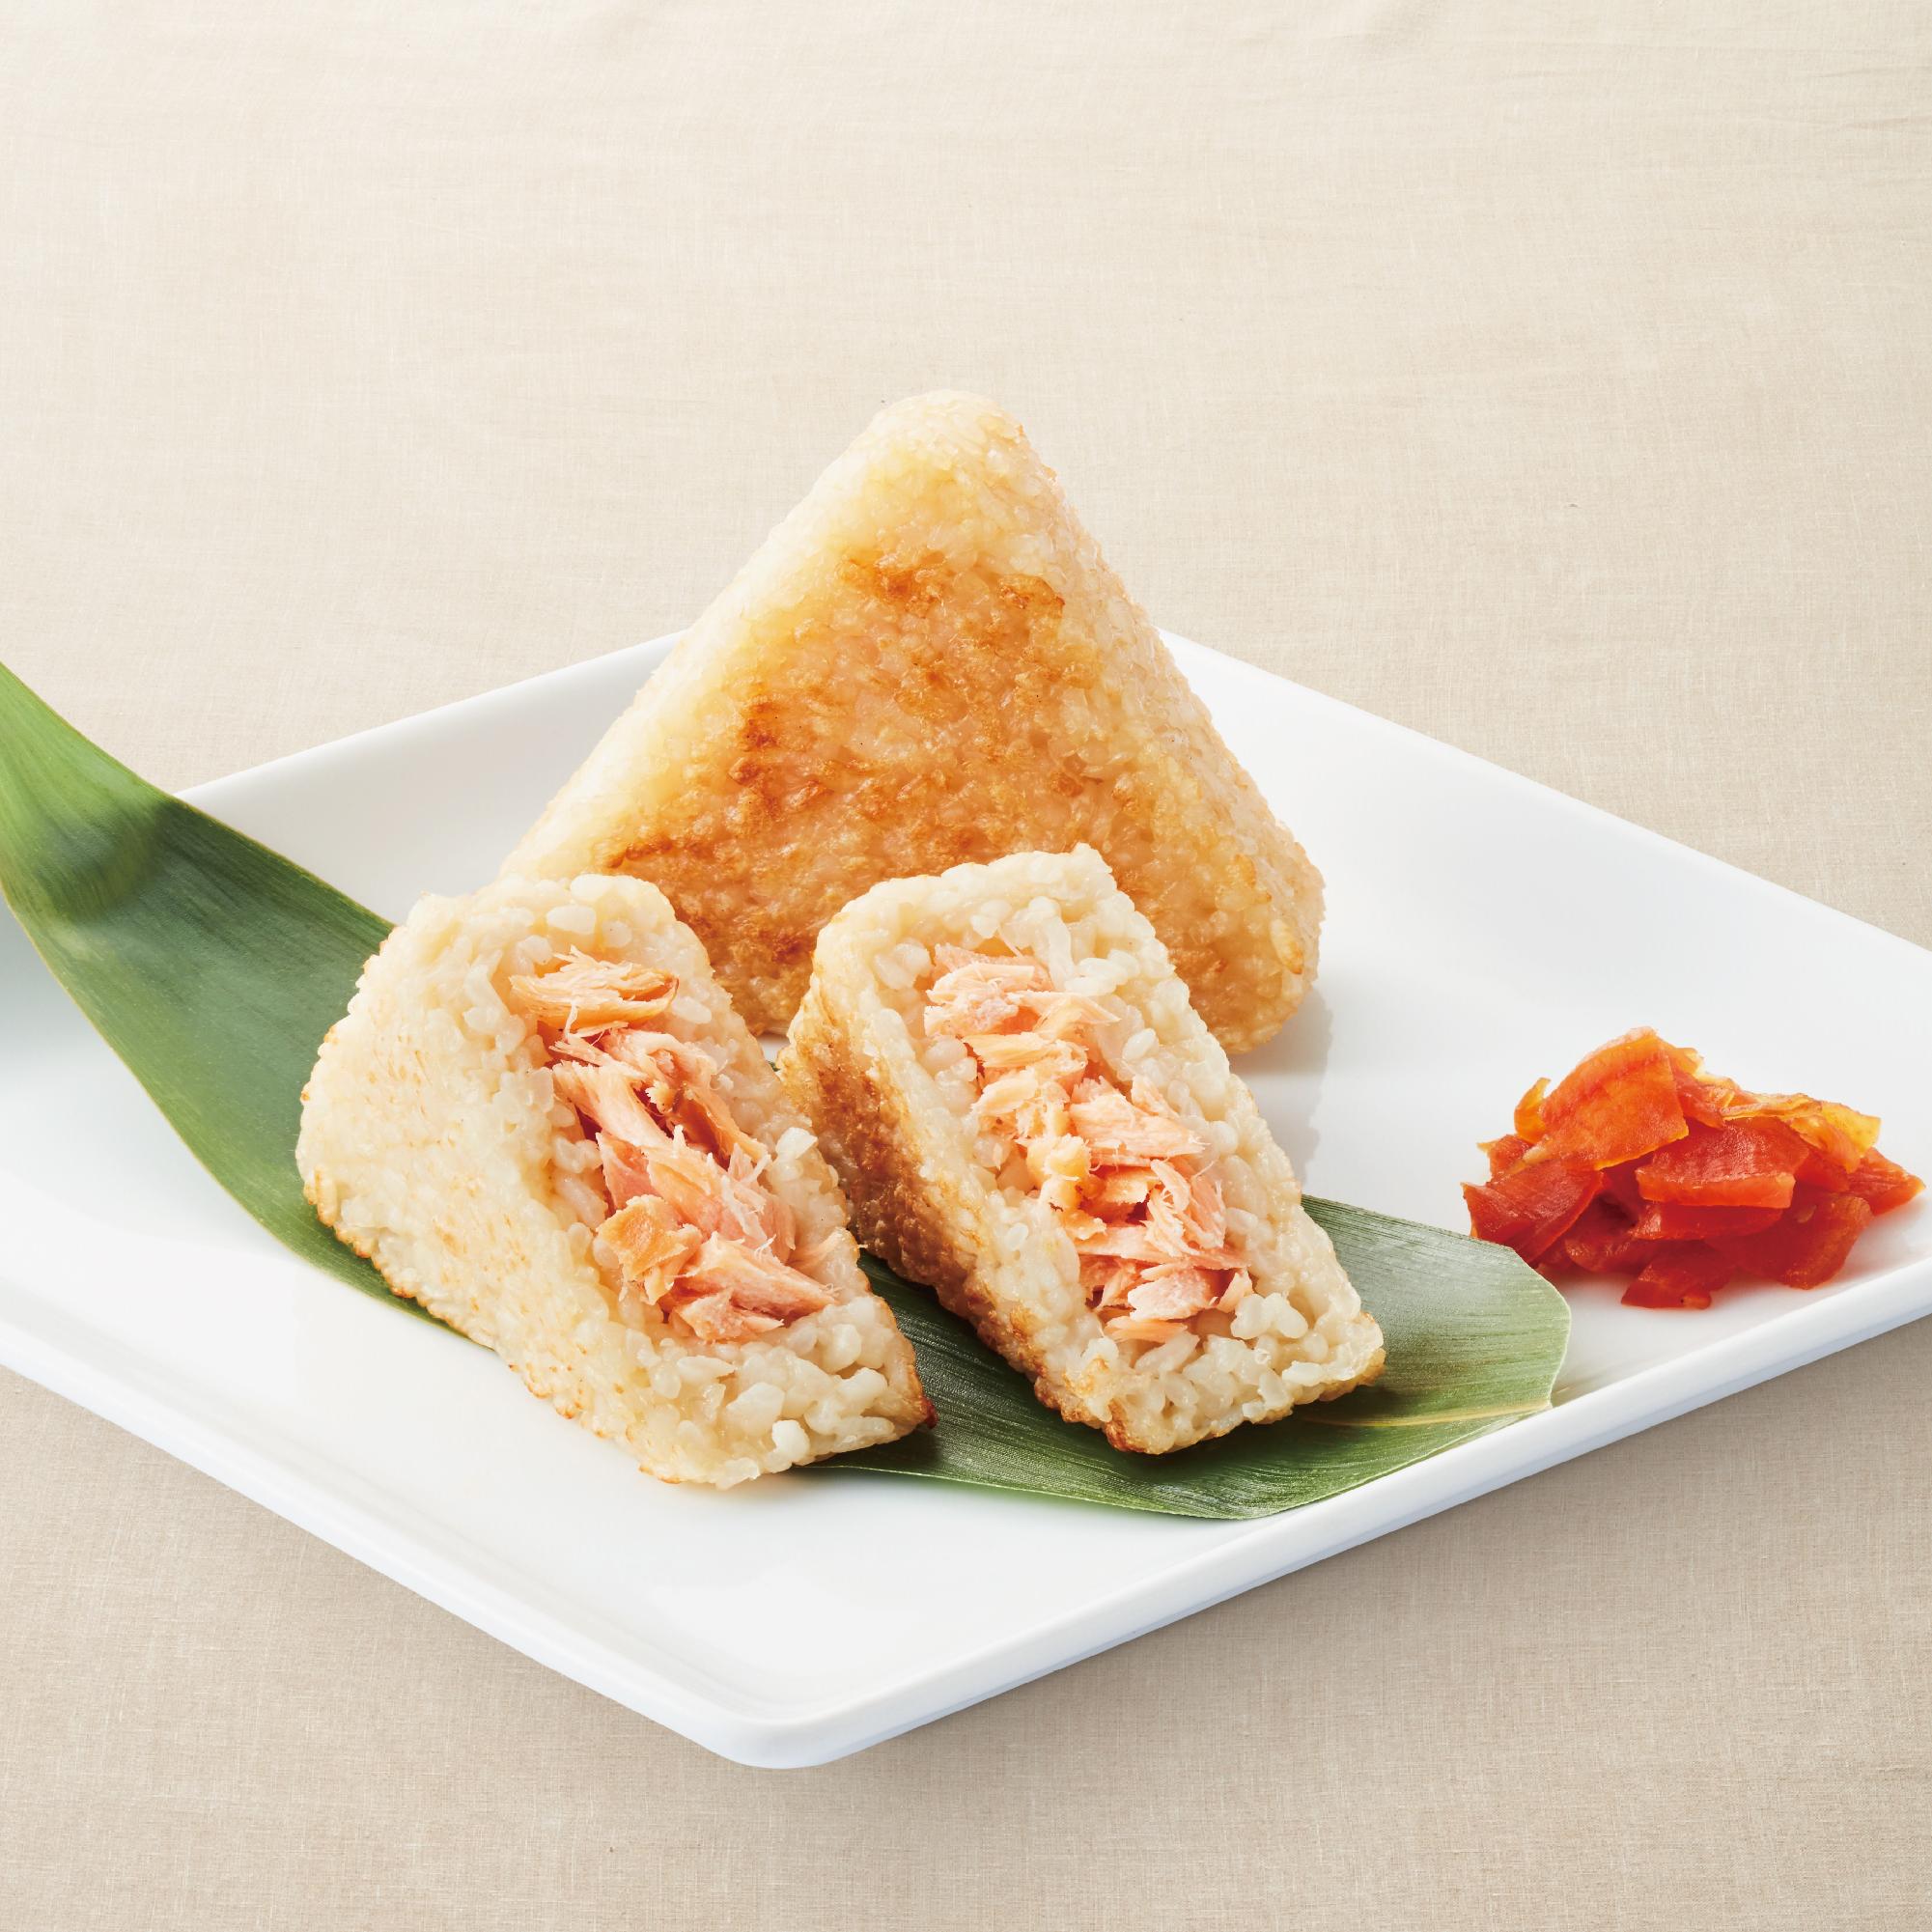 Yaki Salmon Onigiri (1 pc)